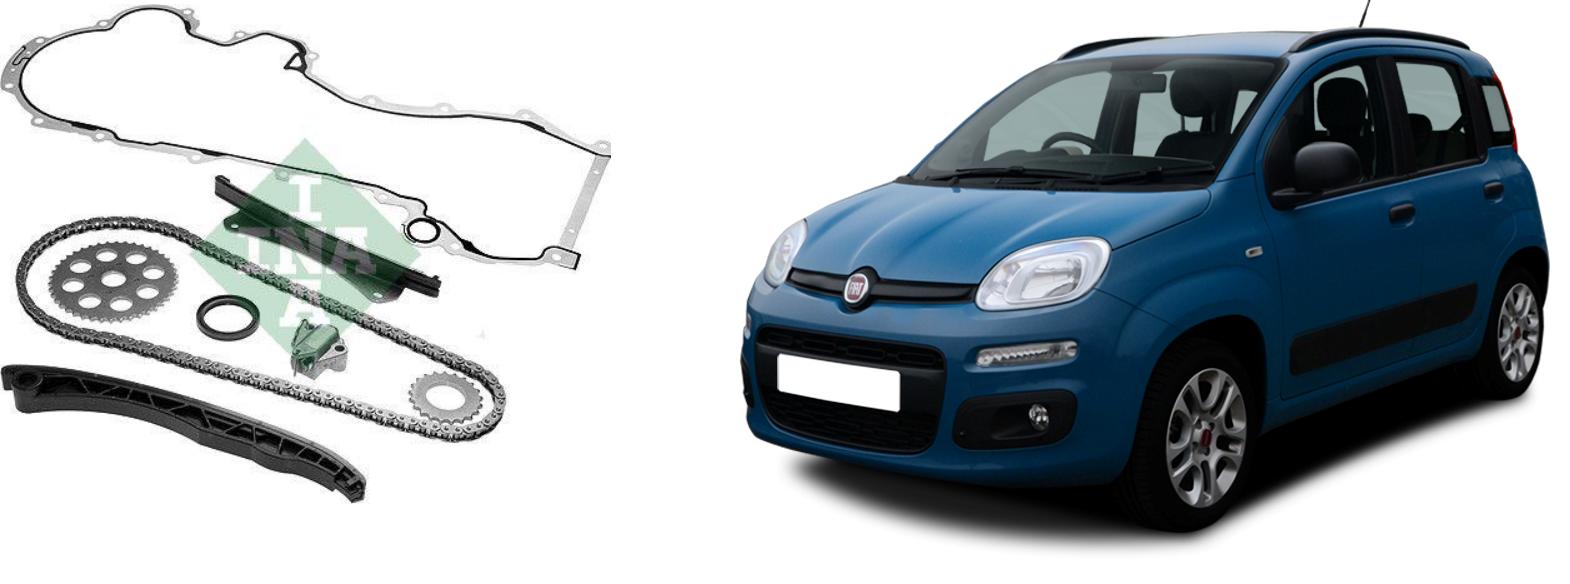 Kit catena distribuzione 1.3 Multijet per Fiat Panda mod. 312